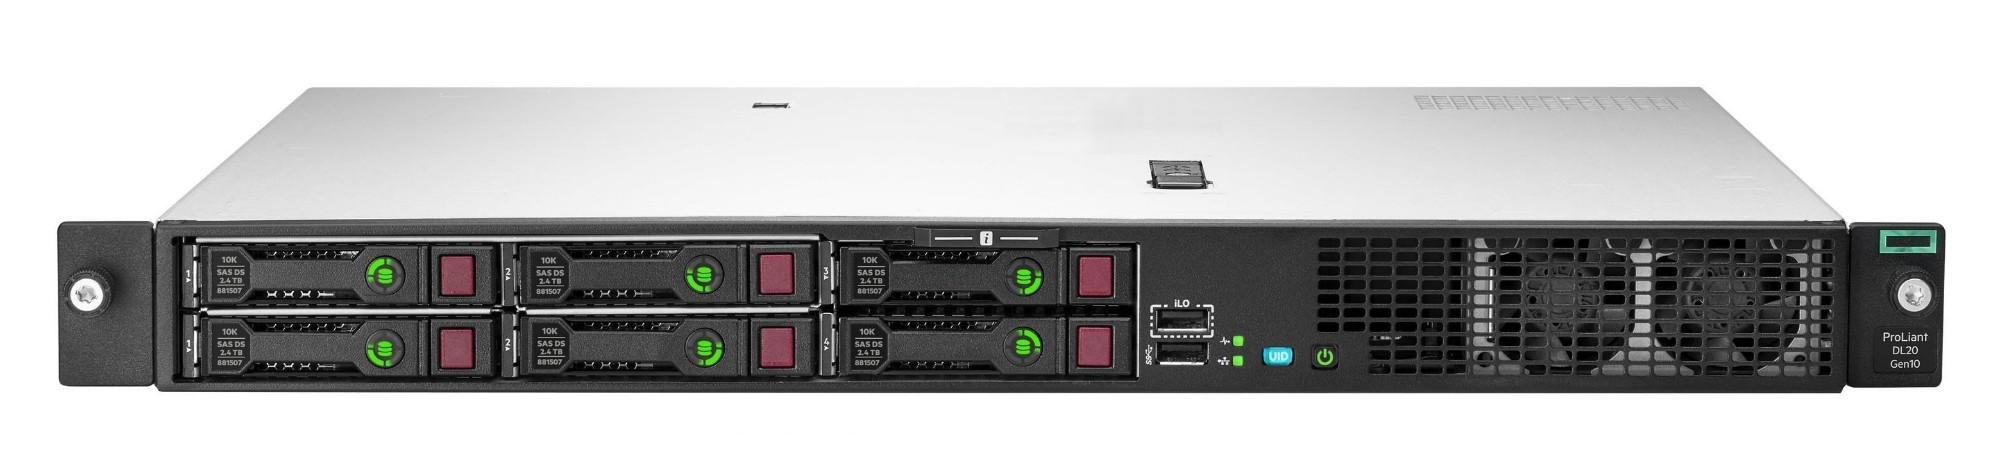 Hewlett Packard Enterprise ProLiant DL20 Gen10 server 12 TB 3.4 GHz 16 GB Rack (1U) Intel Xeon E 500 W DDR4-SDRAM